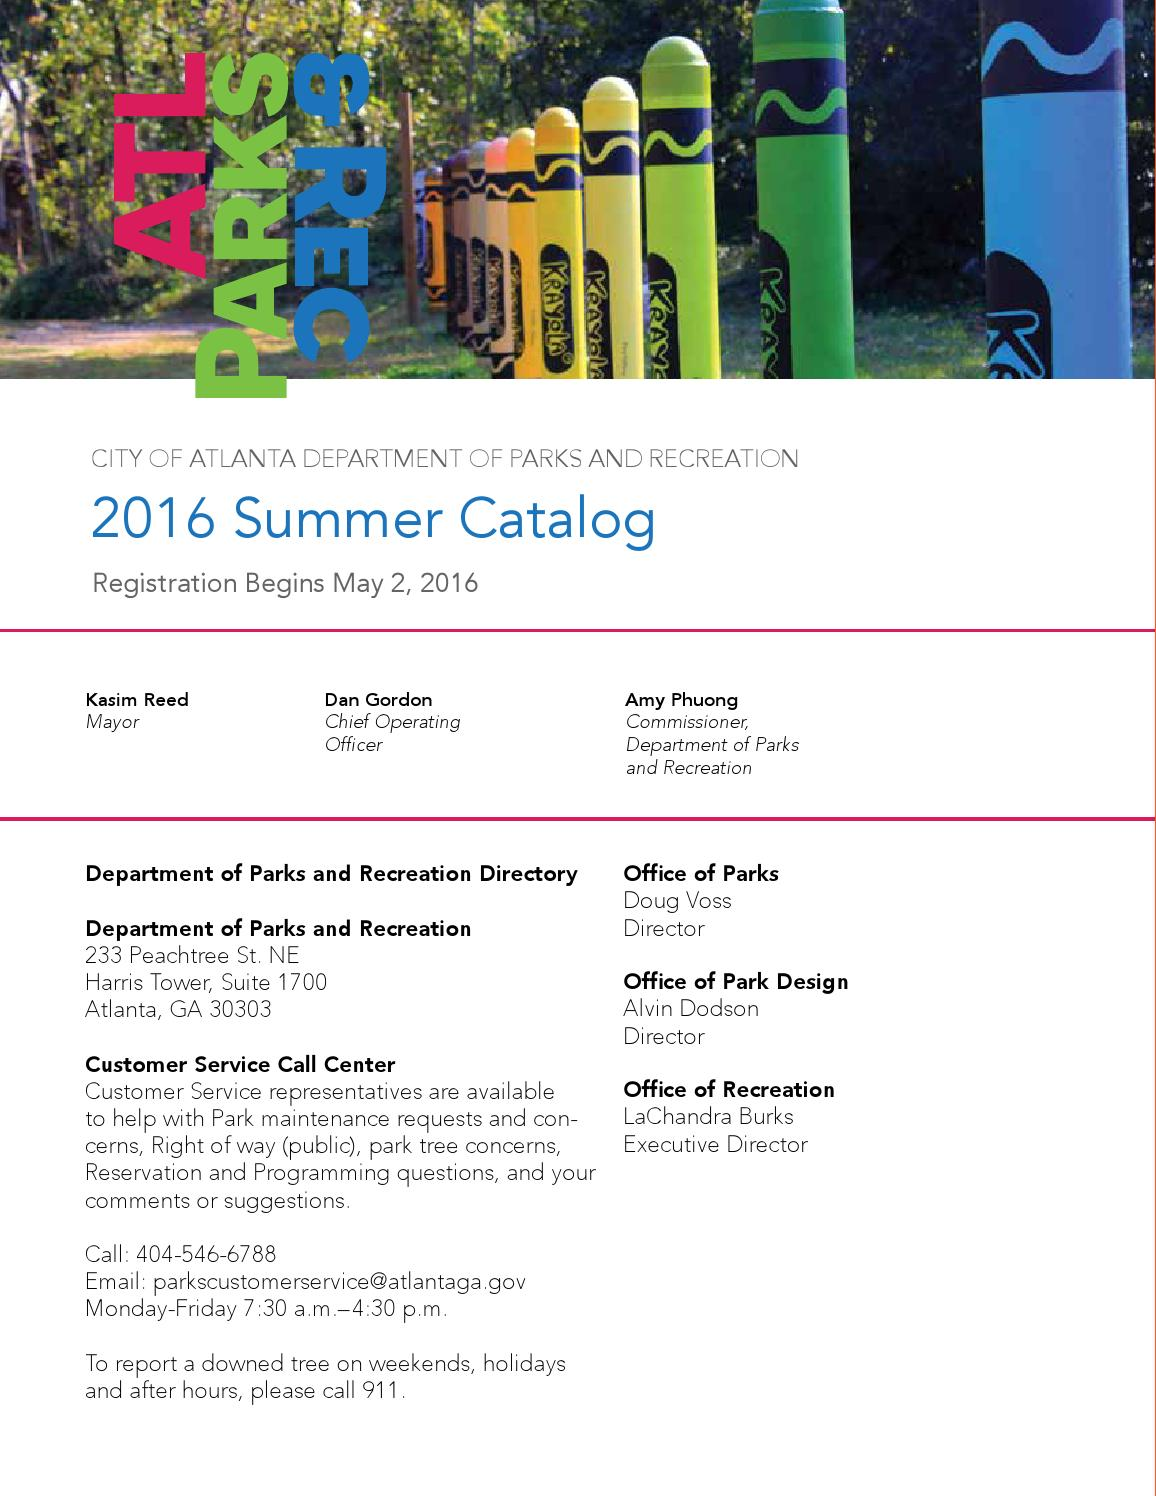 ATL Parks & Rec Catalog 2016 Catalog by Atlanta DPR - issuu